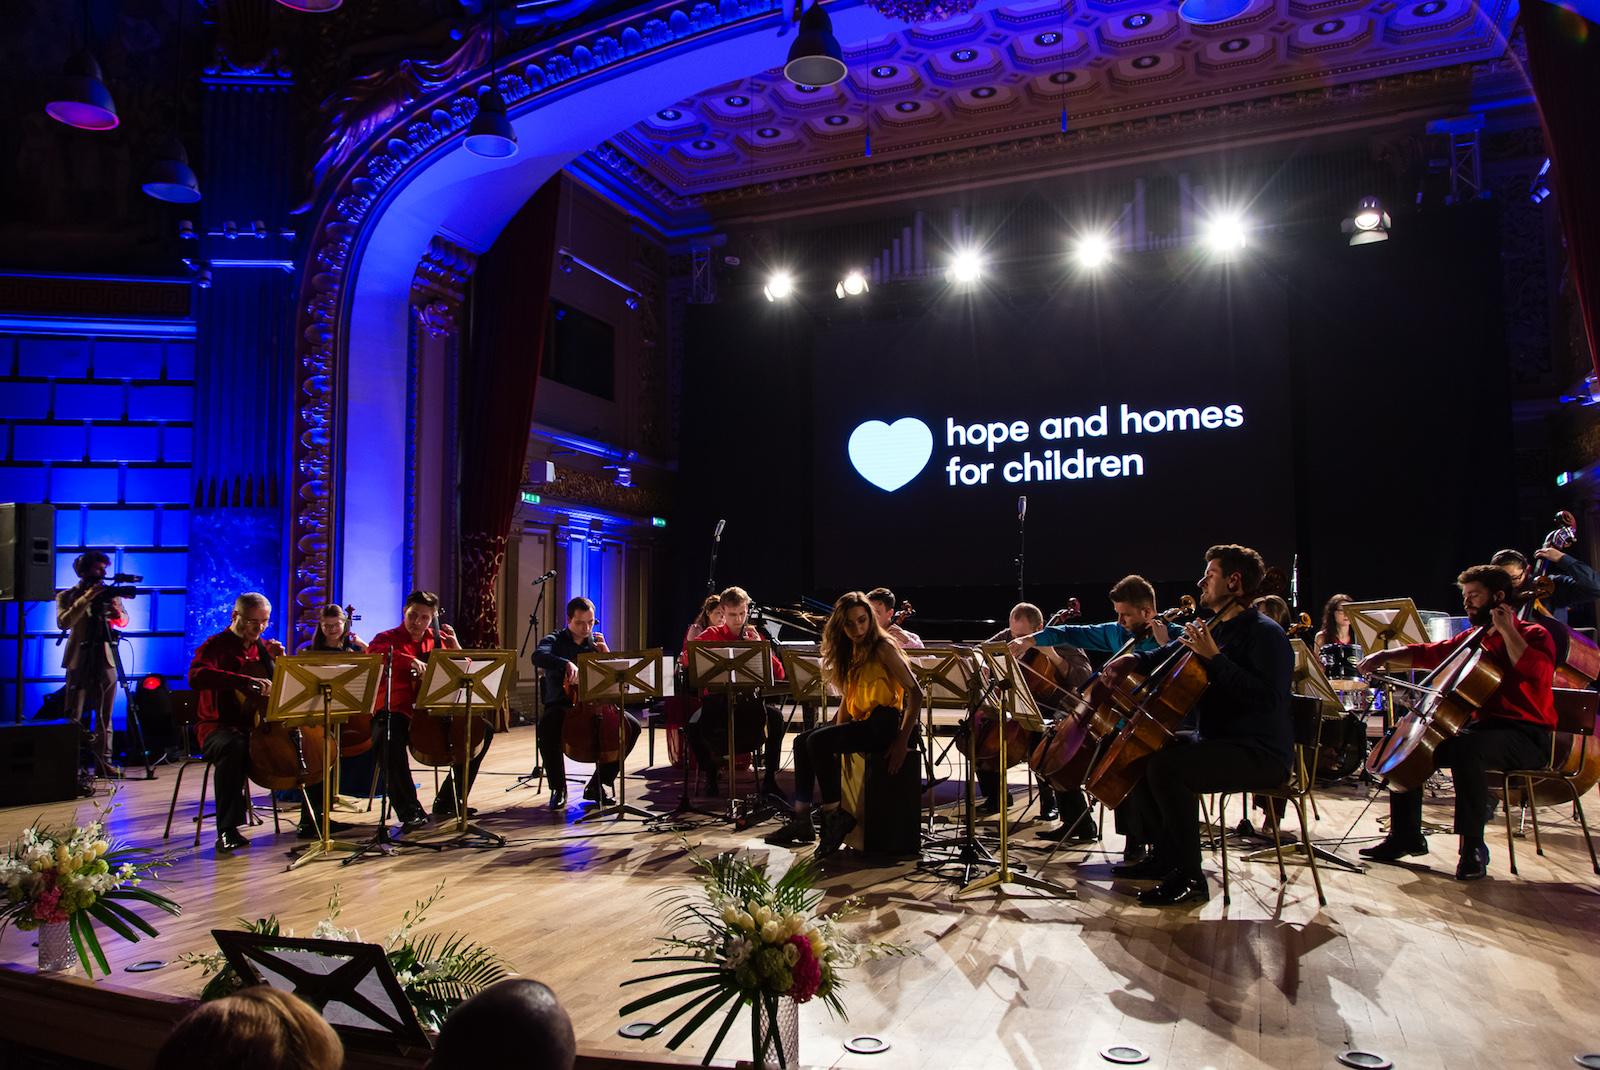 Ansamblul Violoncellissimo_Hope Concert 2017_Foto Mihnea Ciulei.jpg